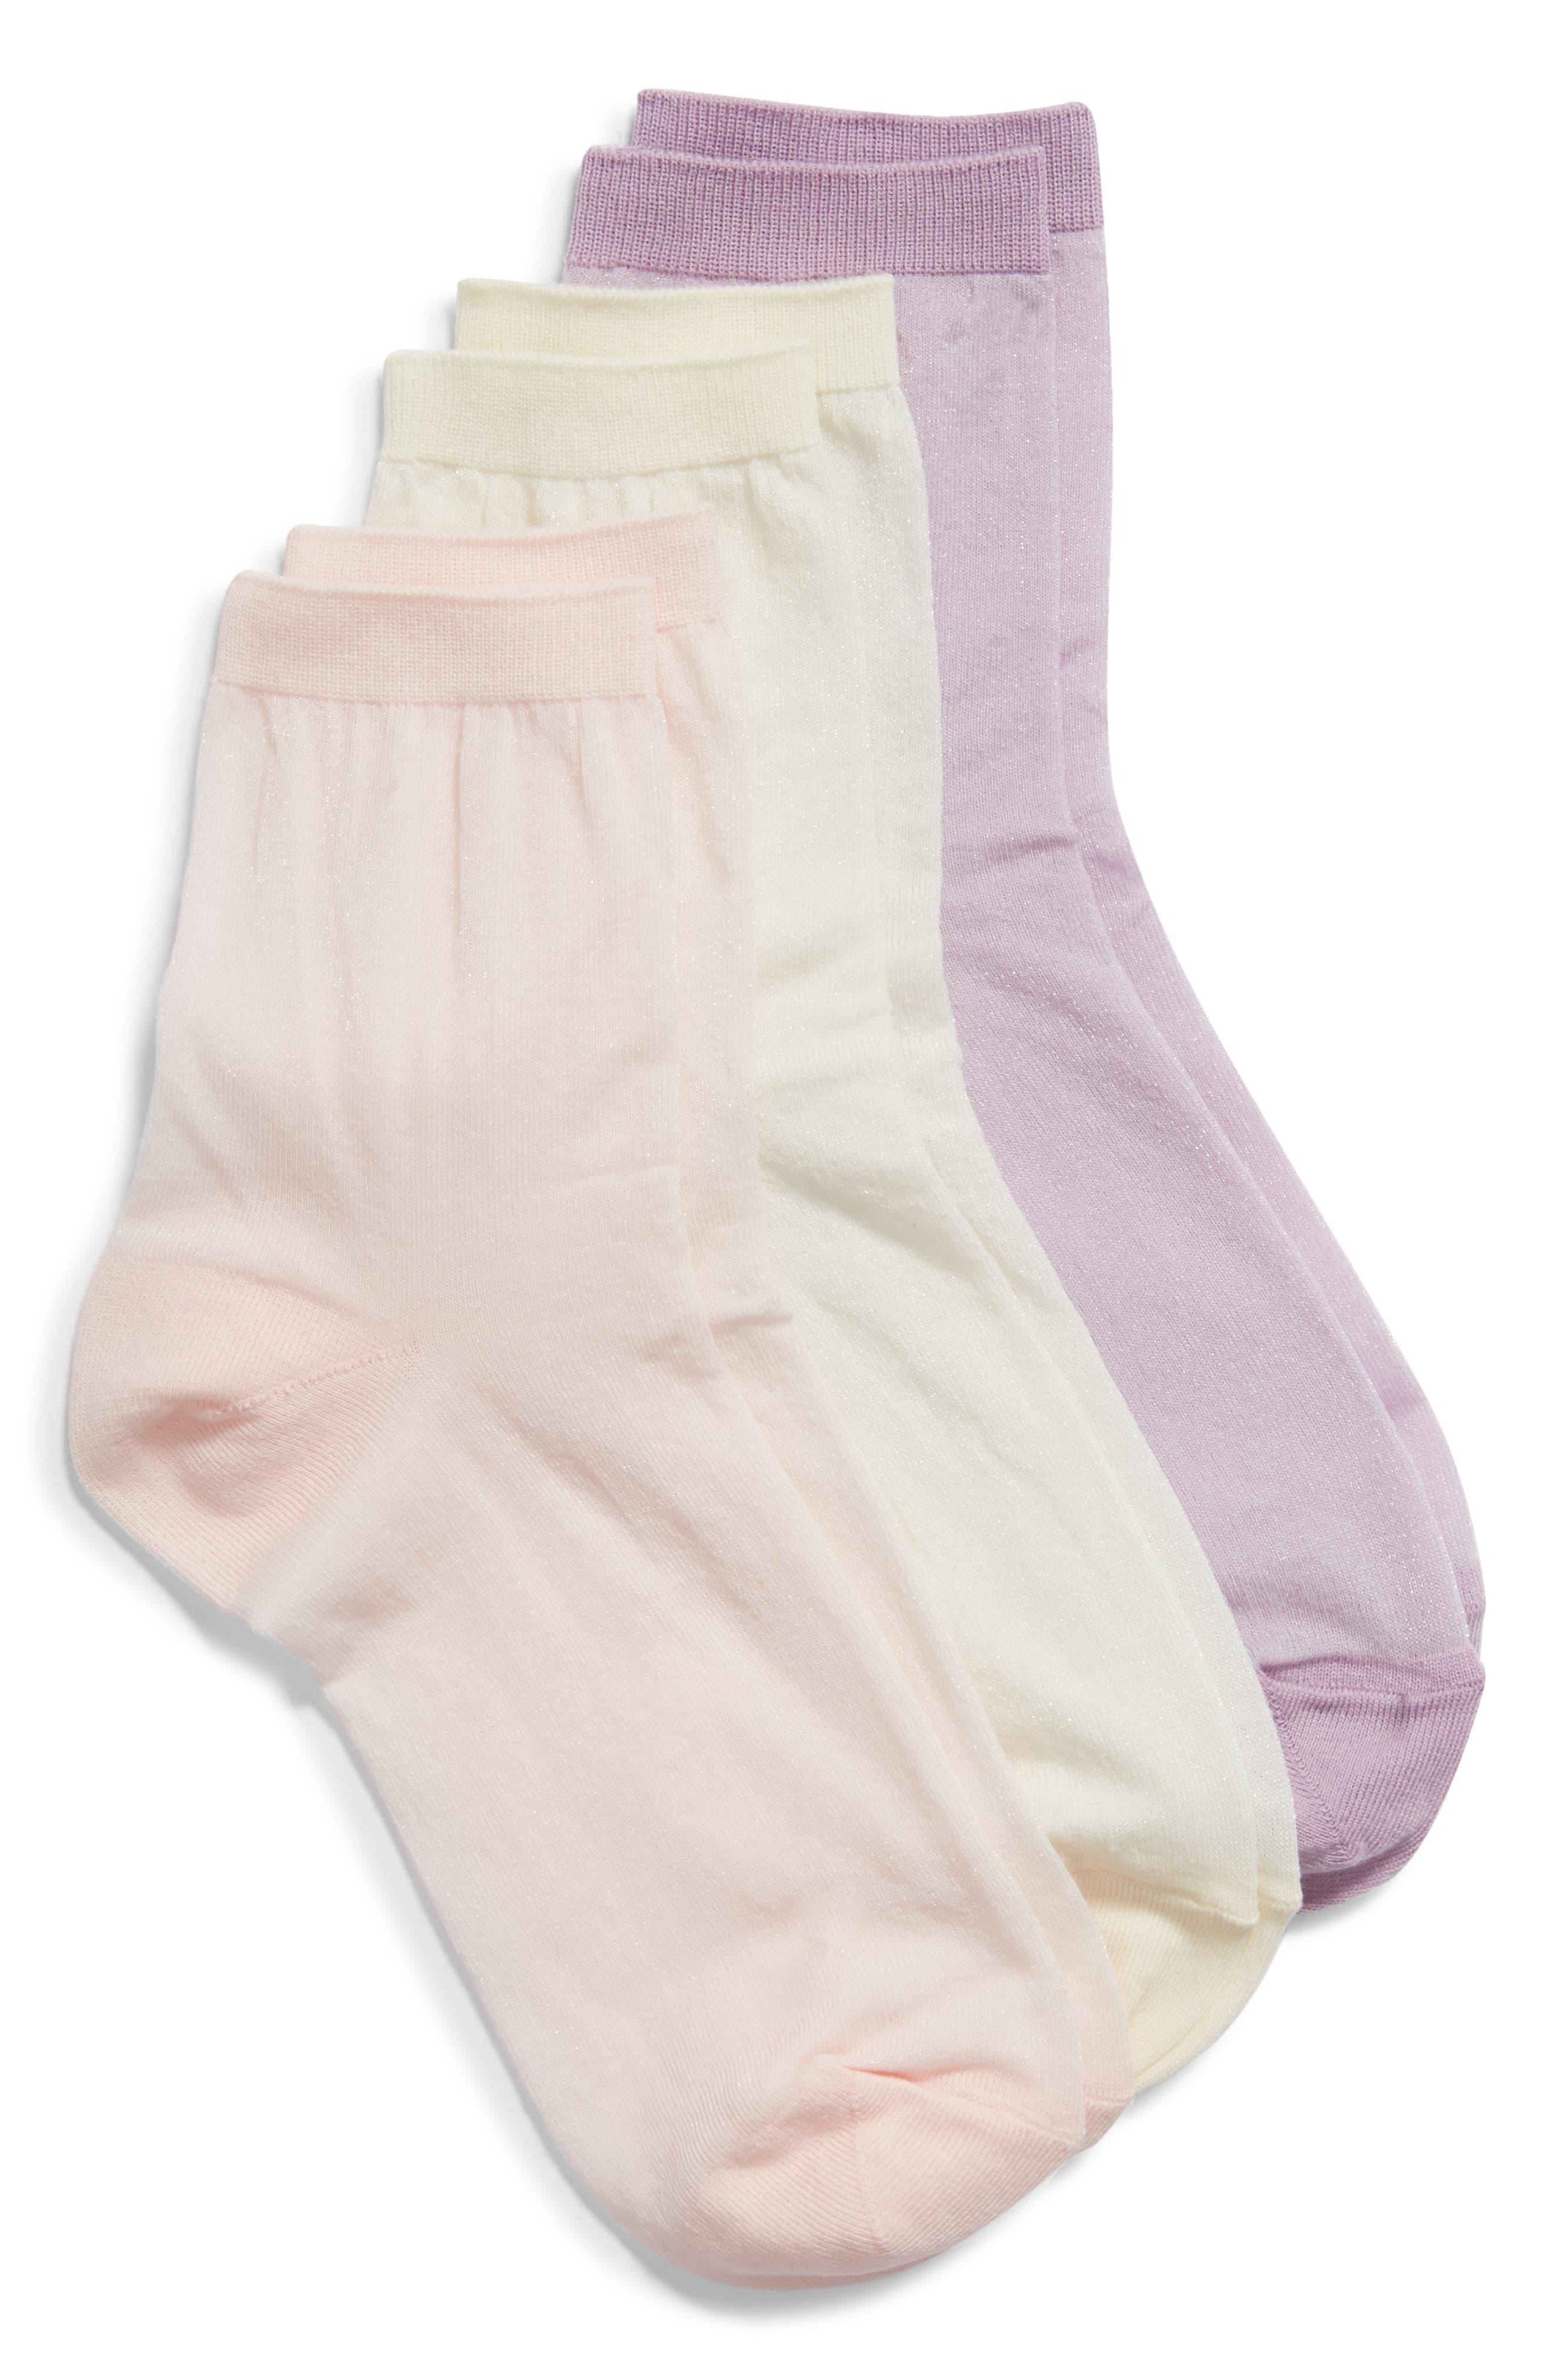 Nordstrom Favorite 3-Pack Ankle Socks | Nordstrom